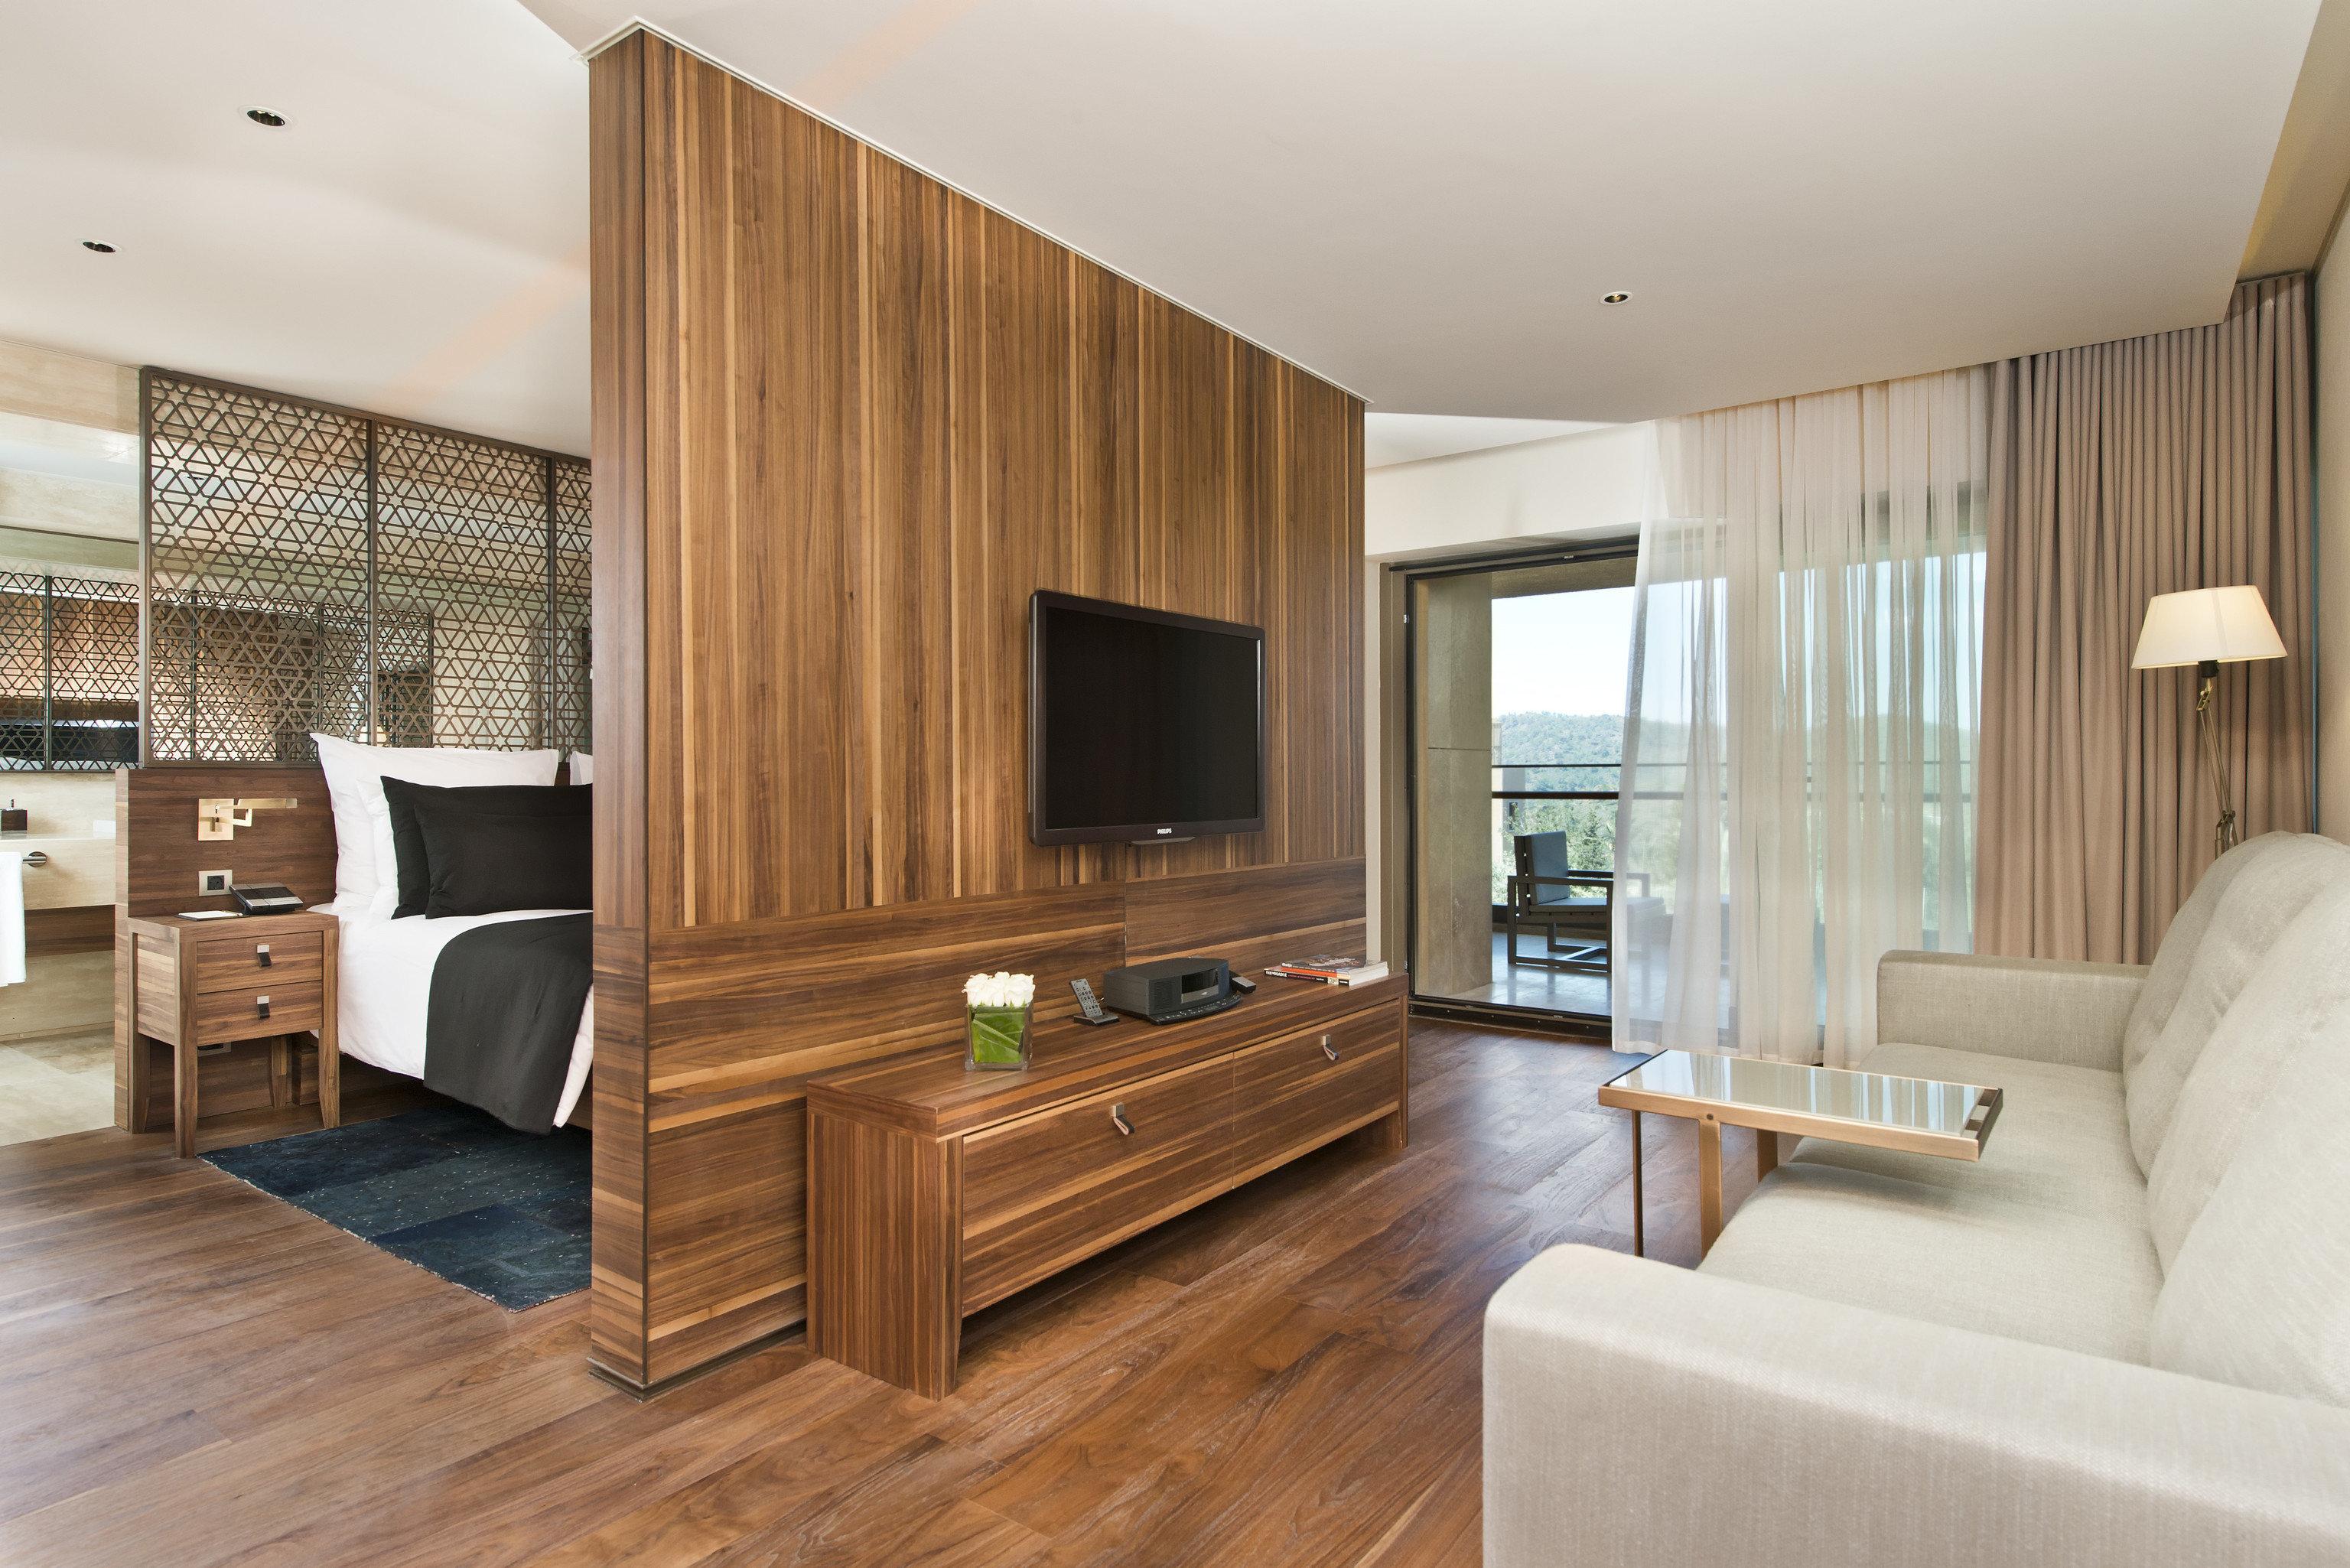 sofa property living room home hardwood wooden cabinetry condominium wood flooring Suite flooring flat hard Modern